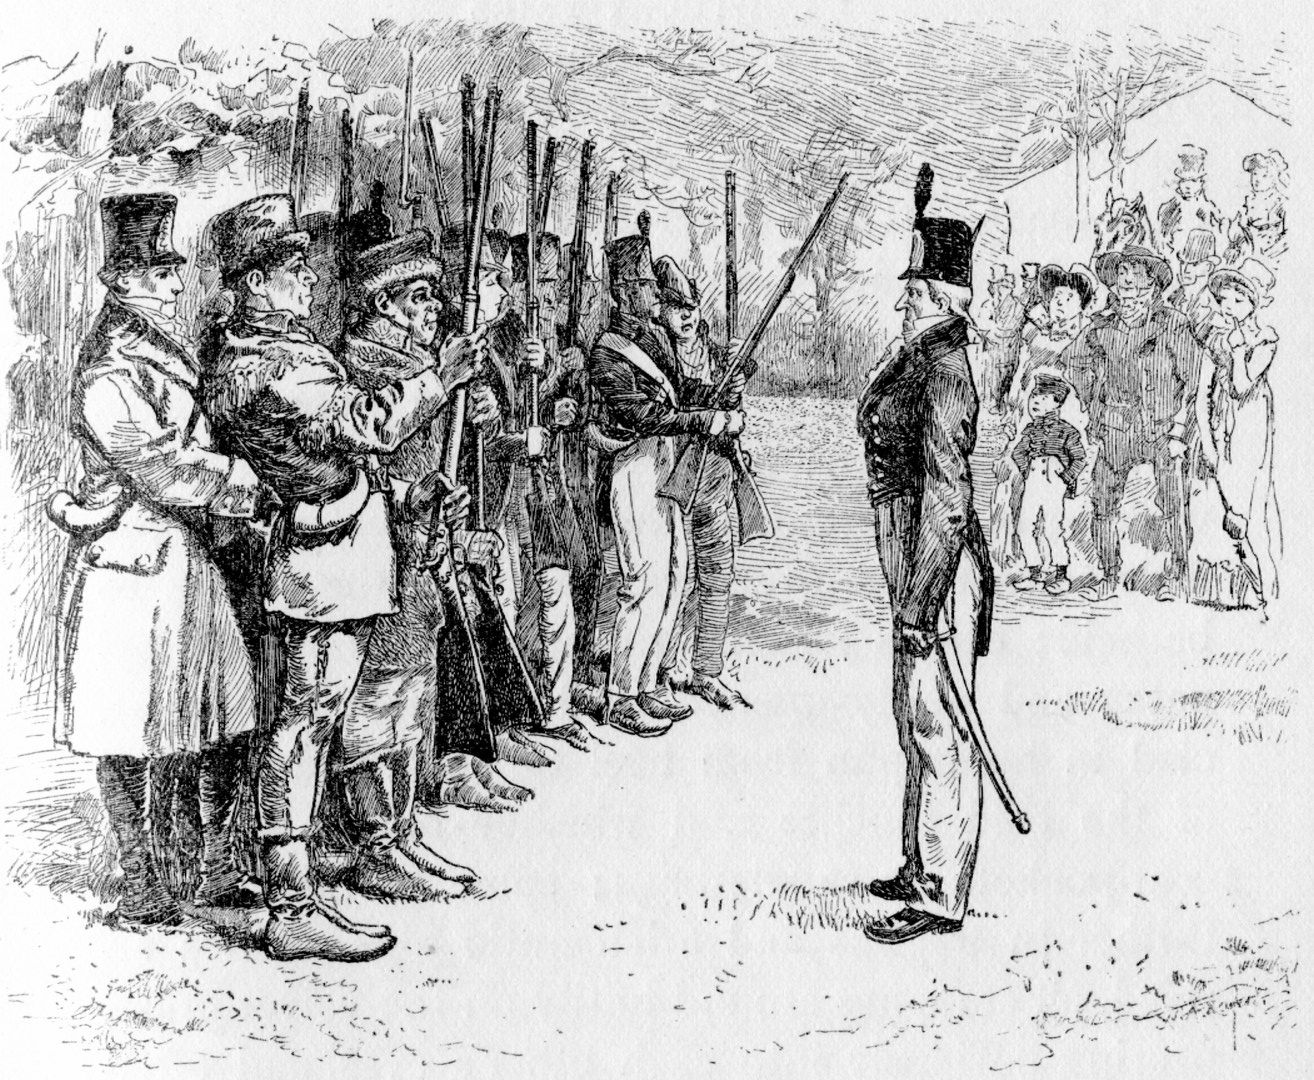 James Lane Allen Pictures The Militia